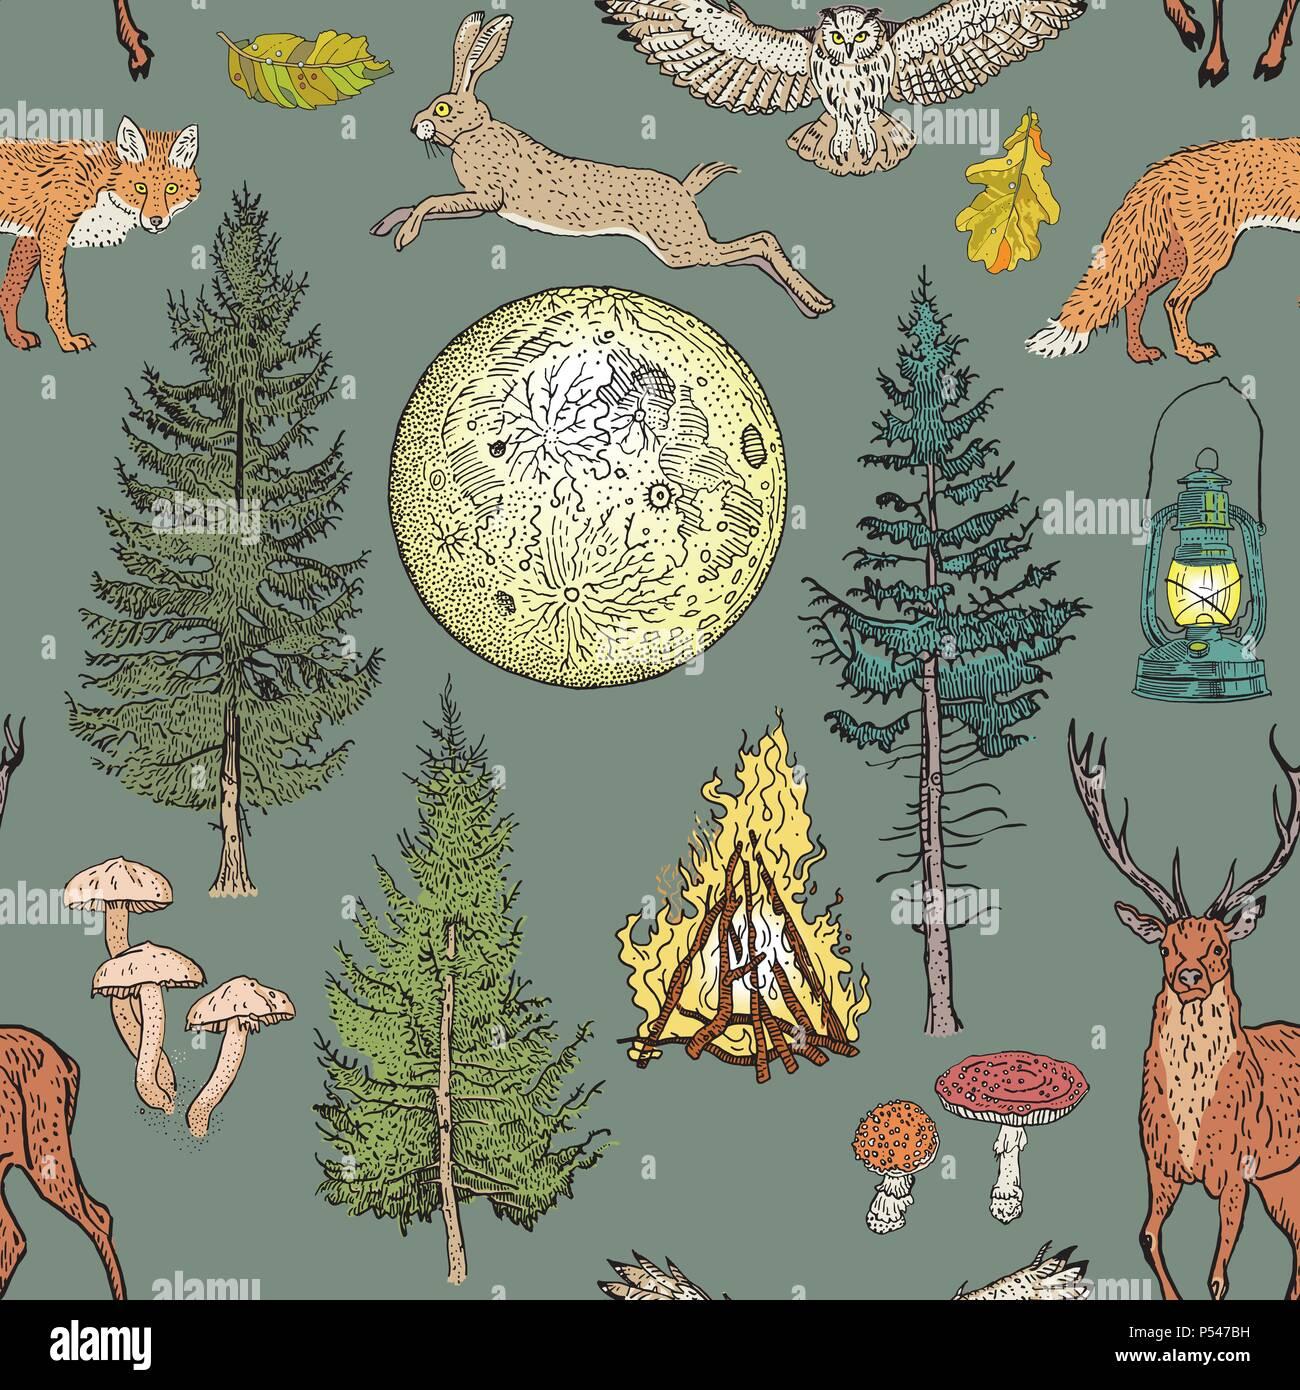 Forest adventure magic seamless pattern: bonfire, camping lamp, full moon, spruce, fir tree, mushrooms, fox, hare, deer, owl. Khaki, green, beige, brown, yellow, orange nature colors. - Stock Vector